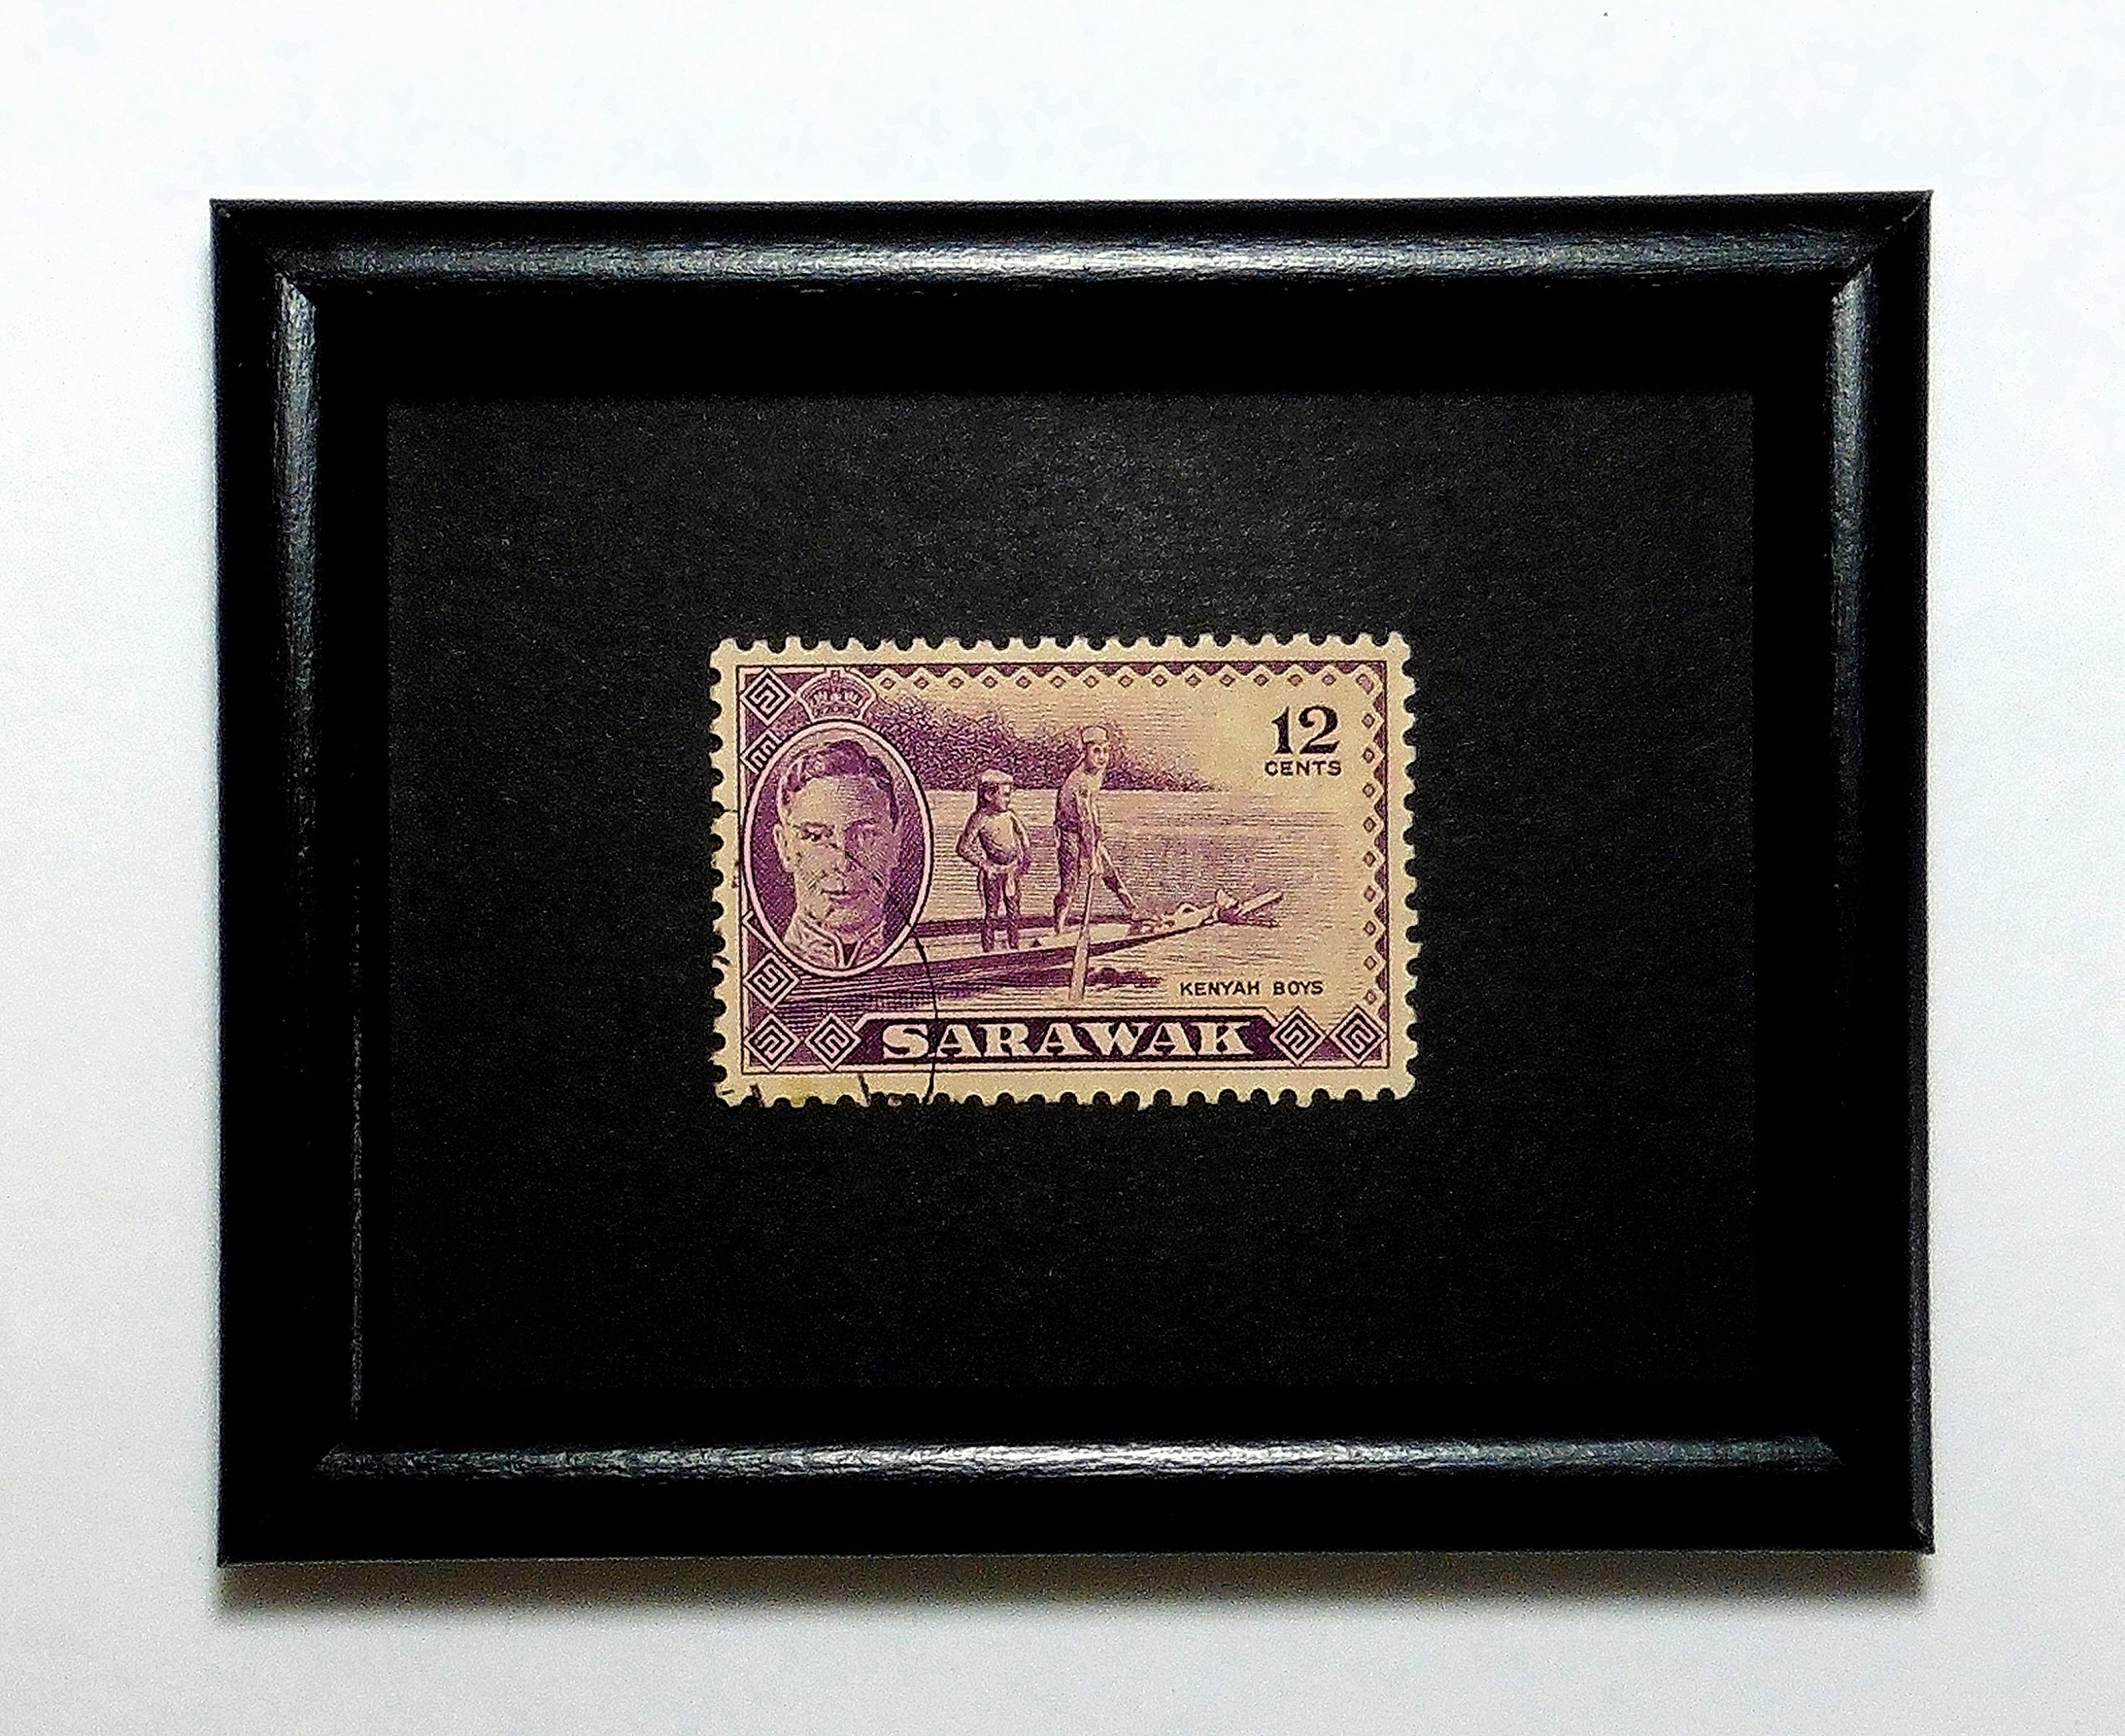 Kenyah Boys -Handmade Framed Postage Stamp Art 1105AM